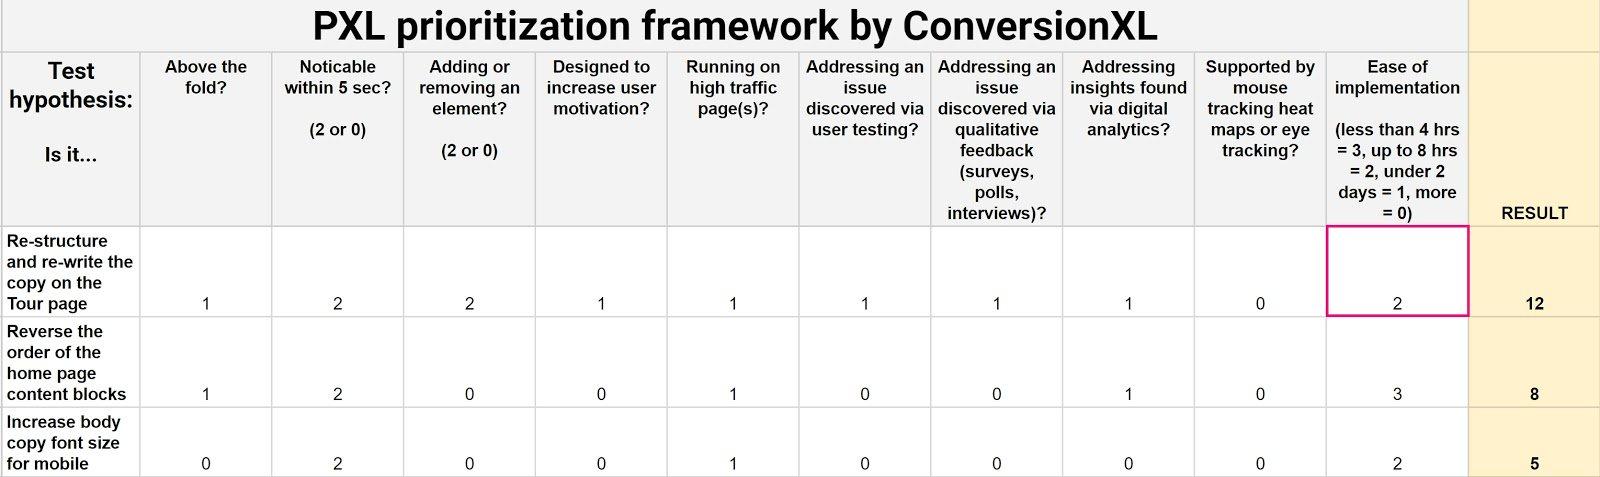 pxl-prioritization-model-conversionXL